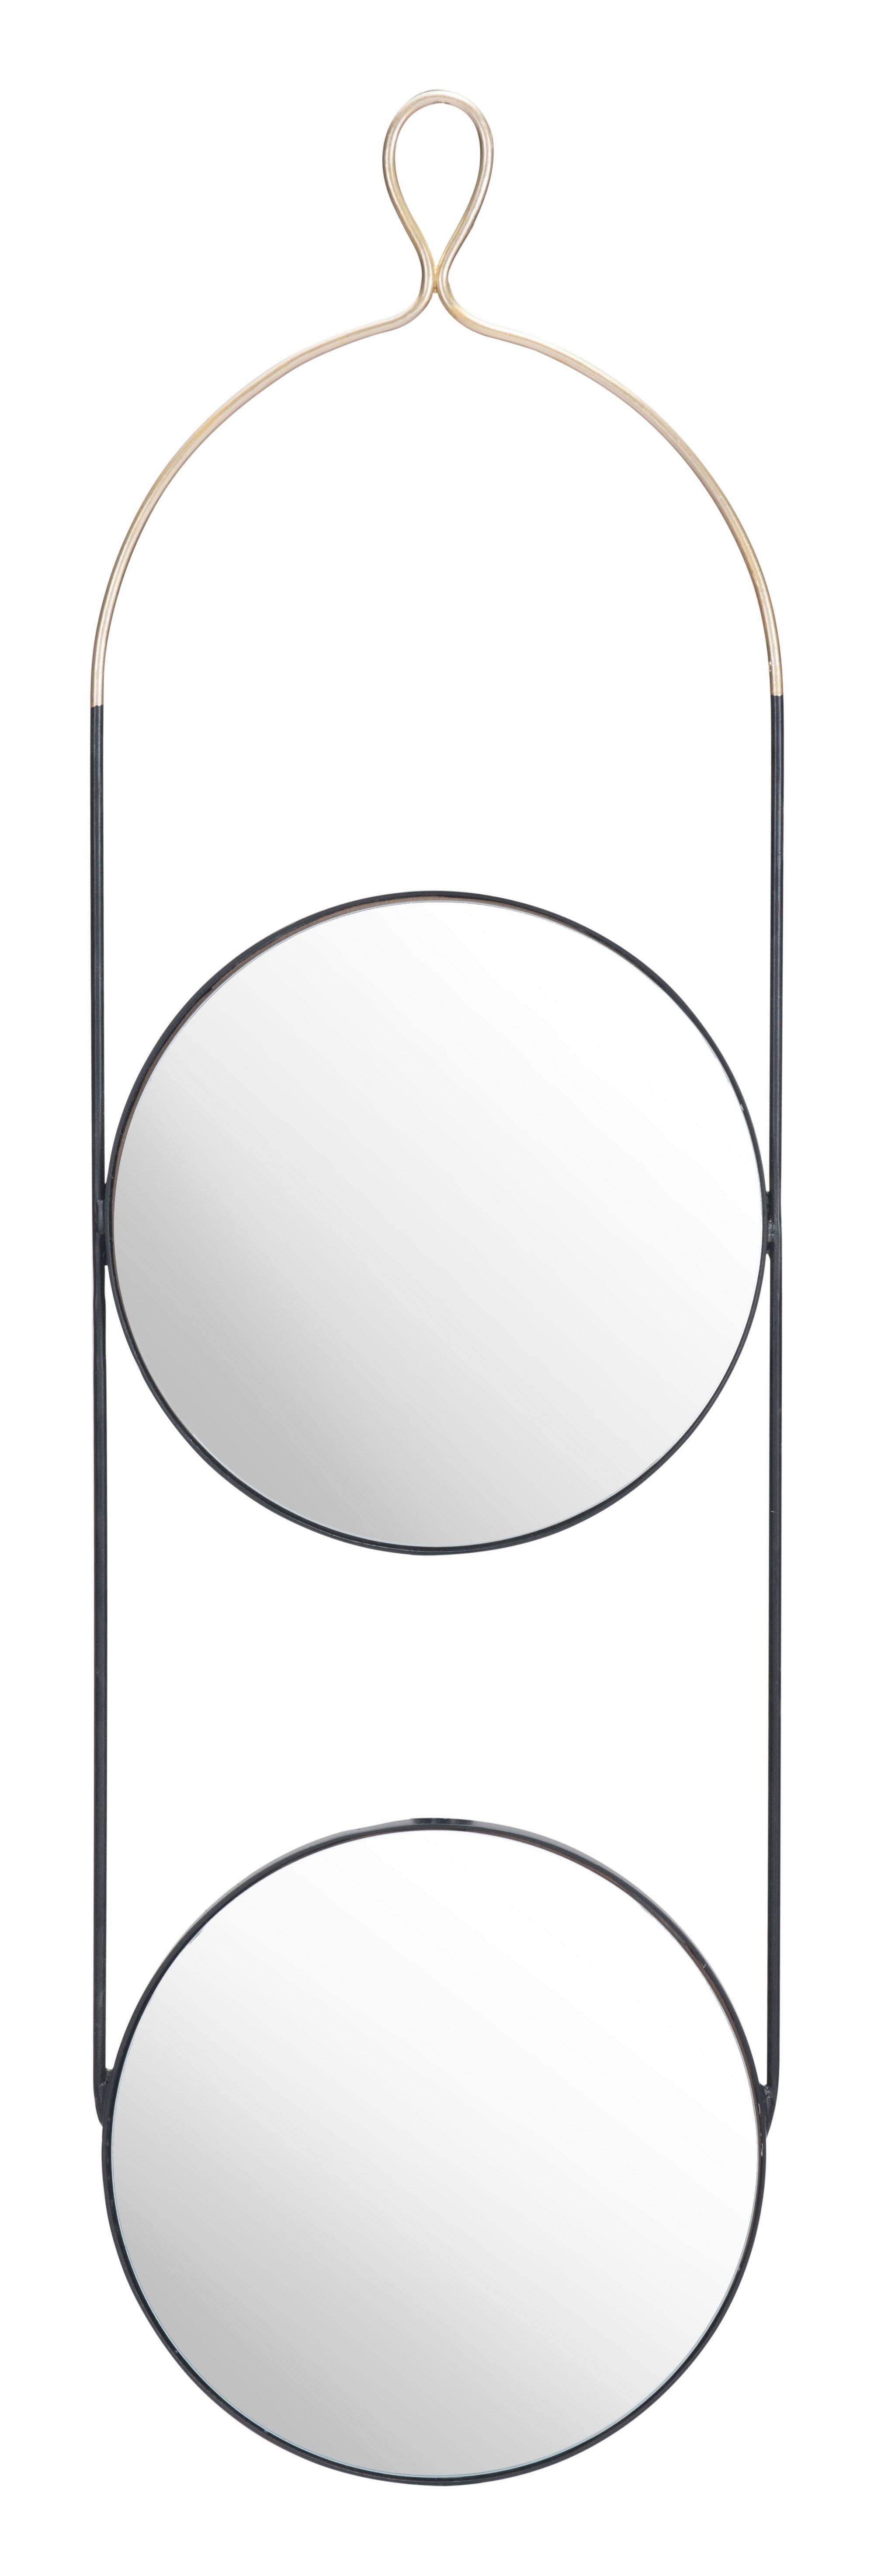 Zodiac Round Mirror Gold & Black